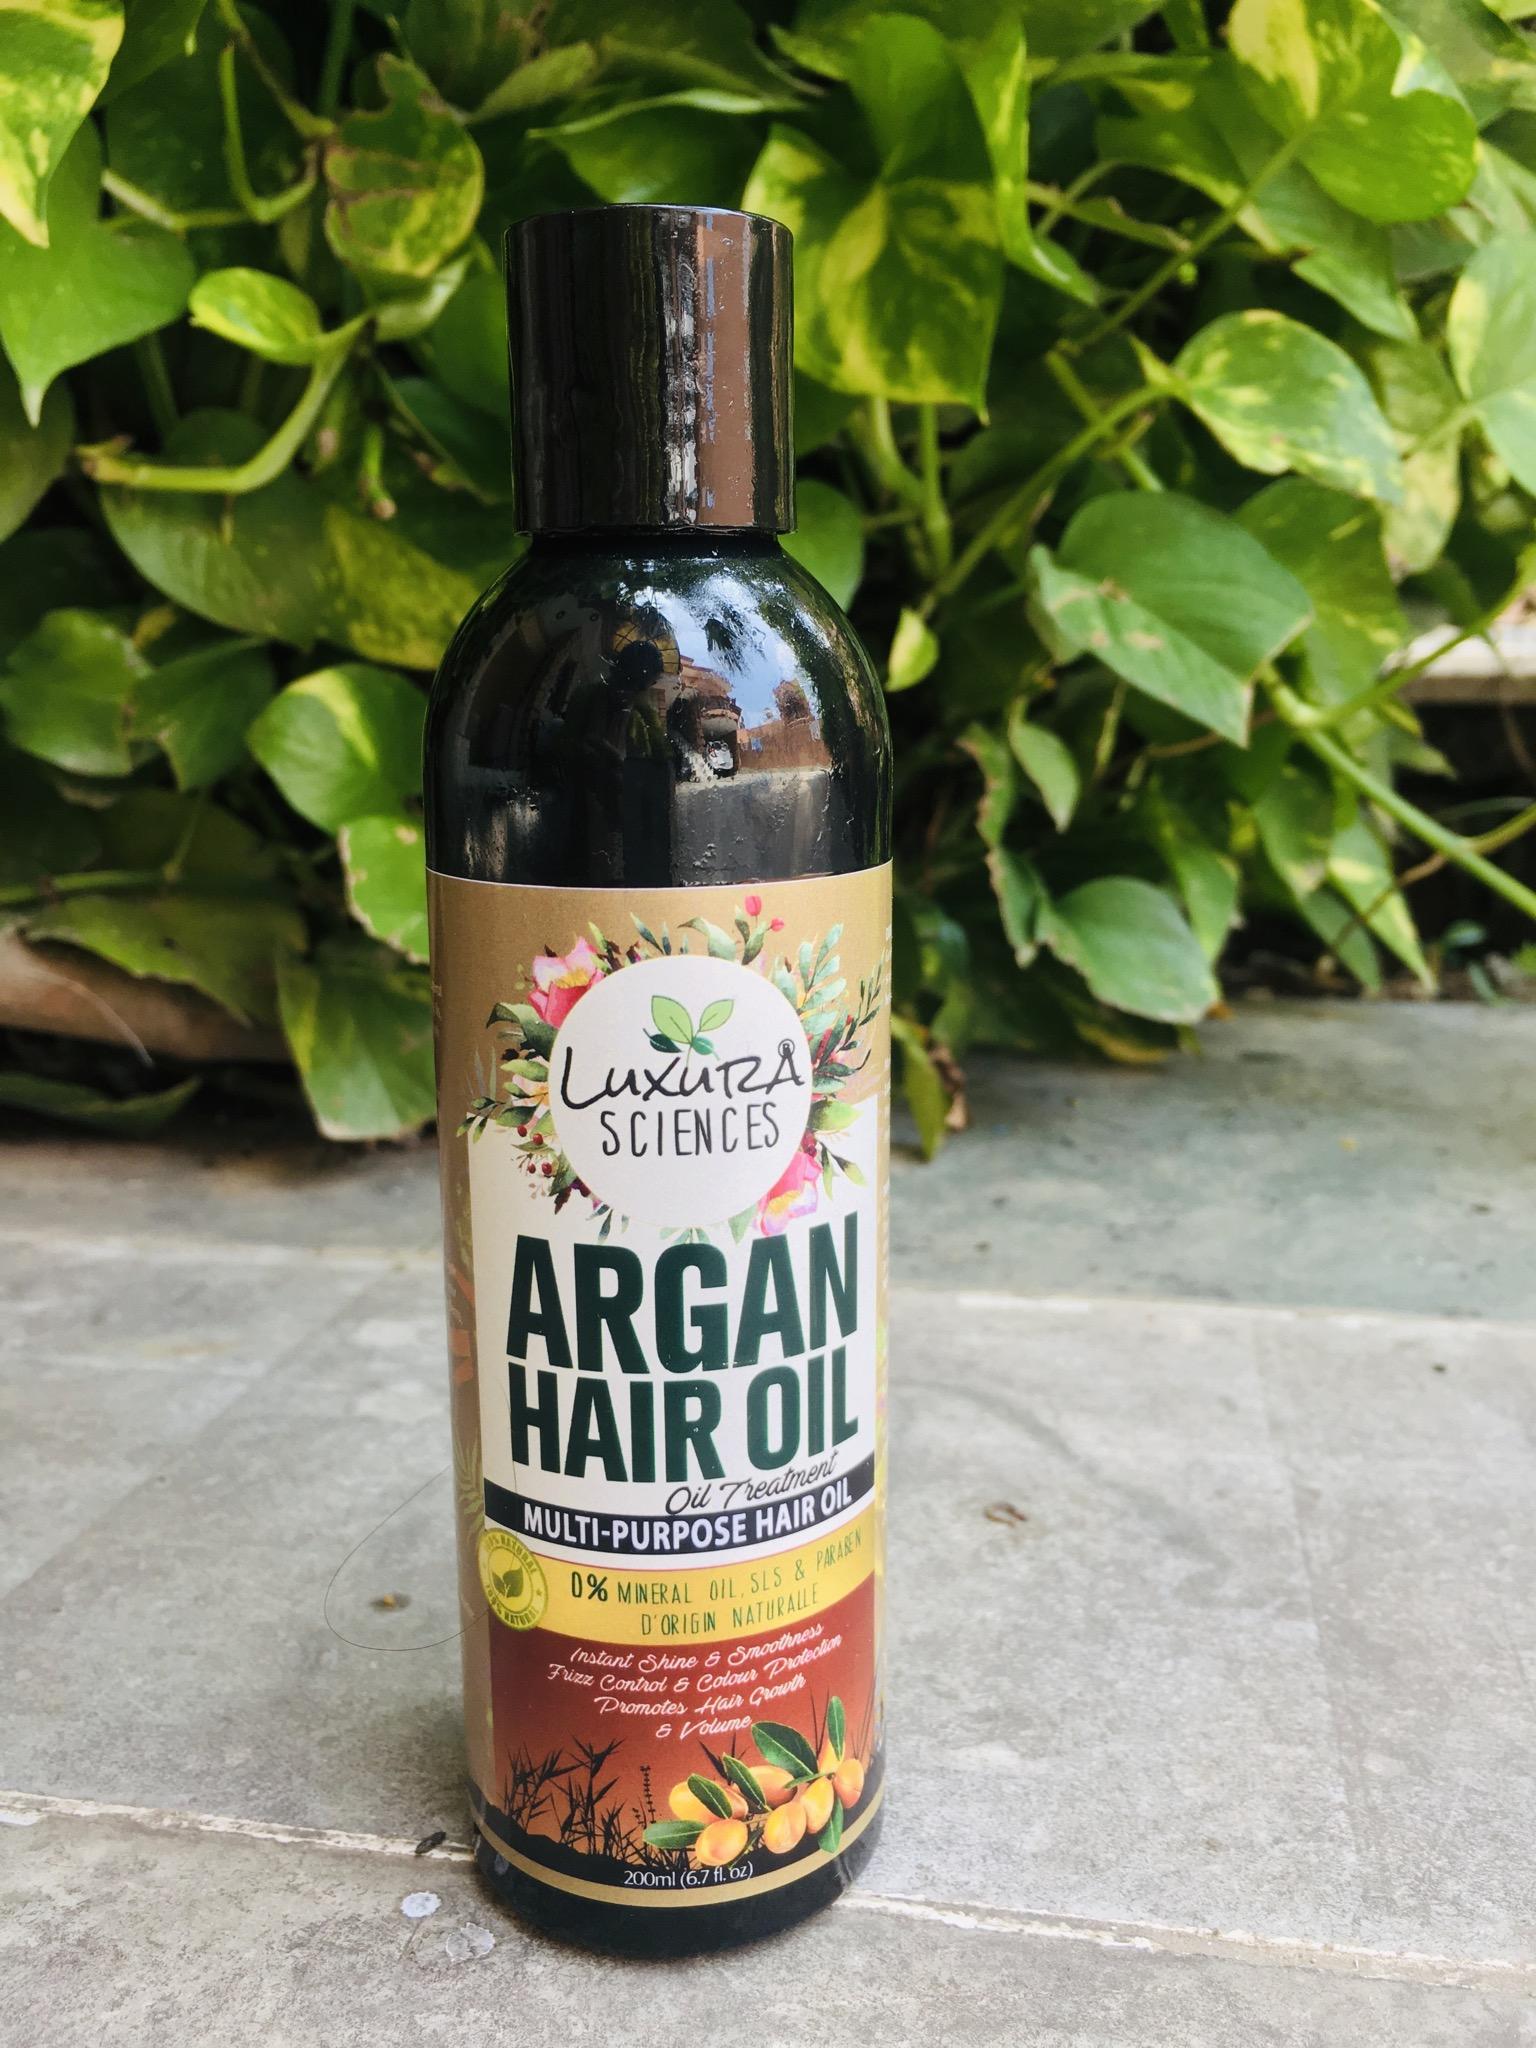 fab-review-Good hair oil-By seema11dhiman